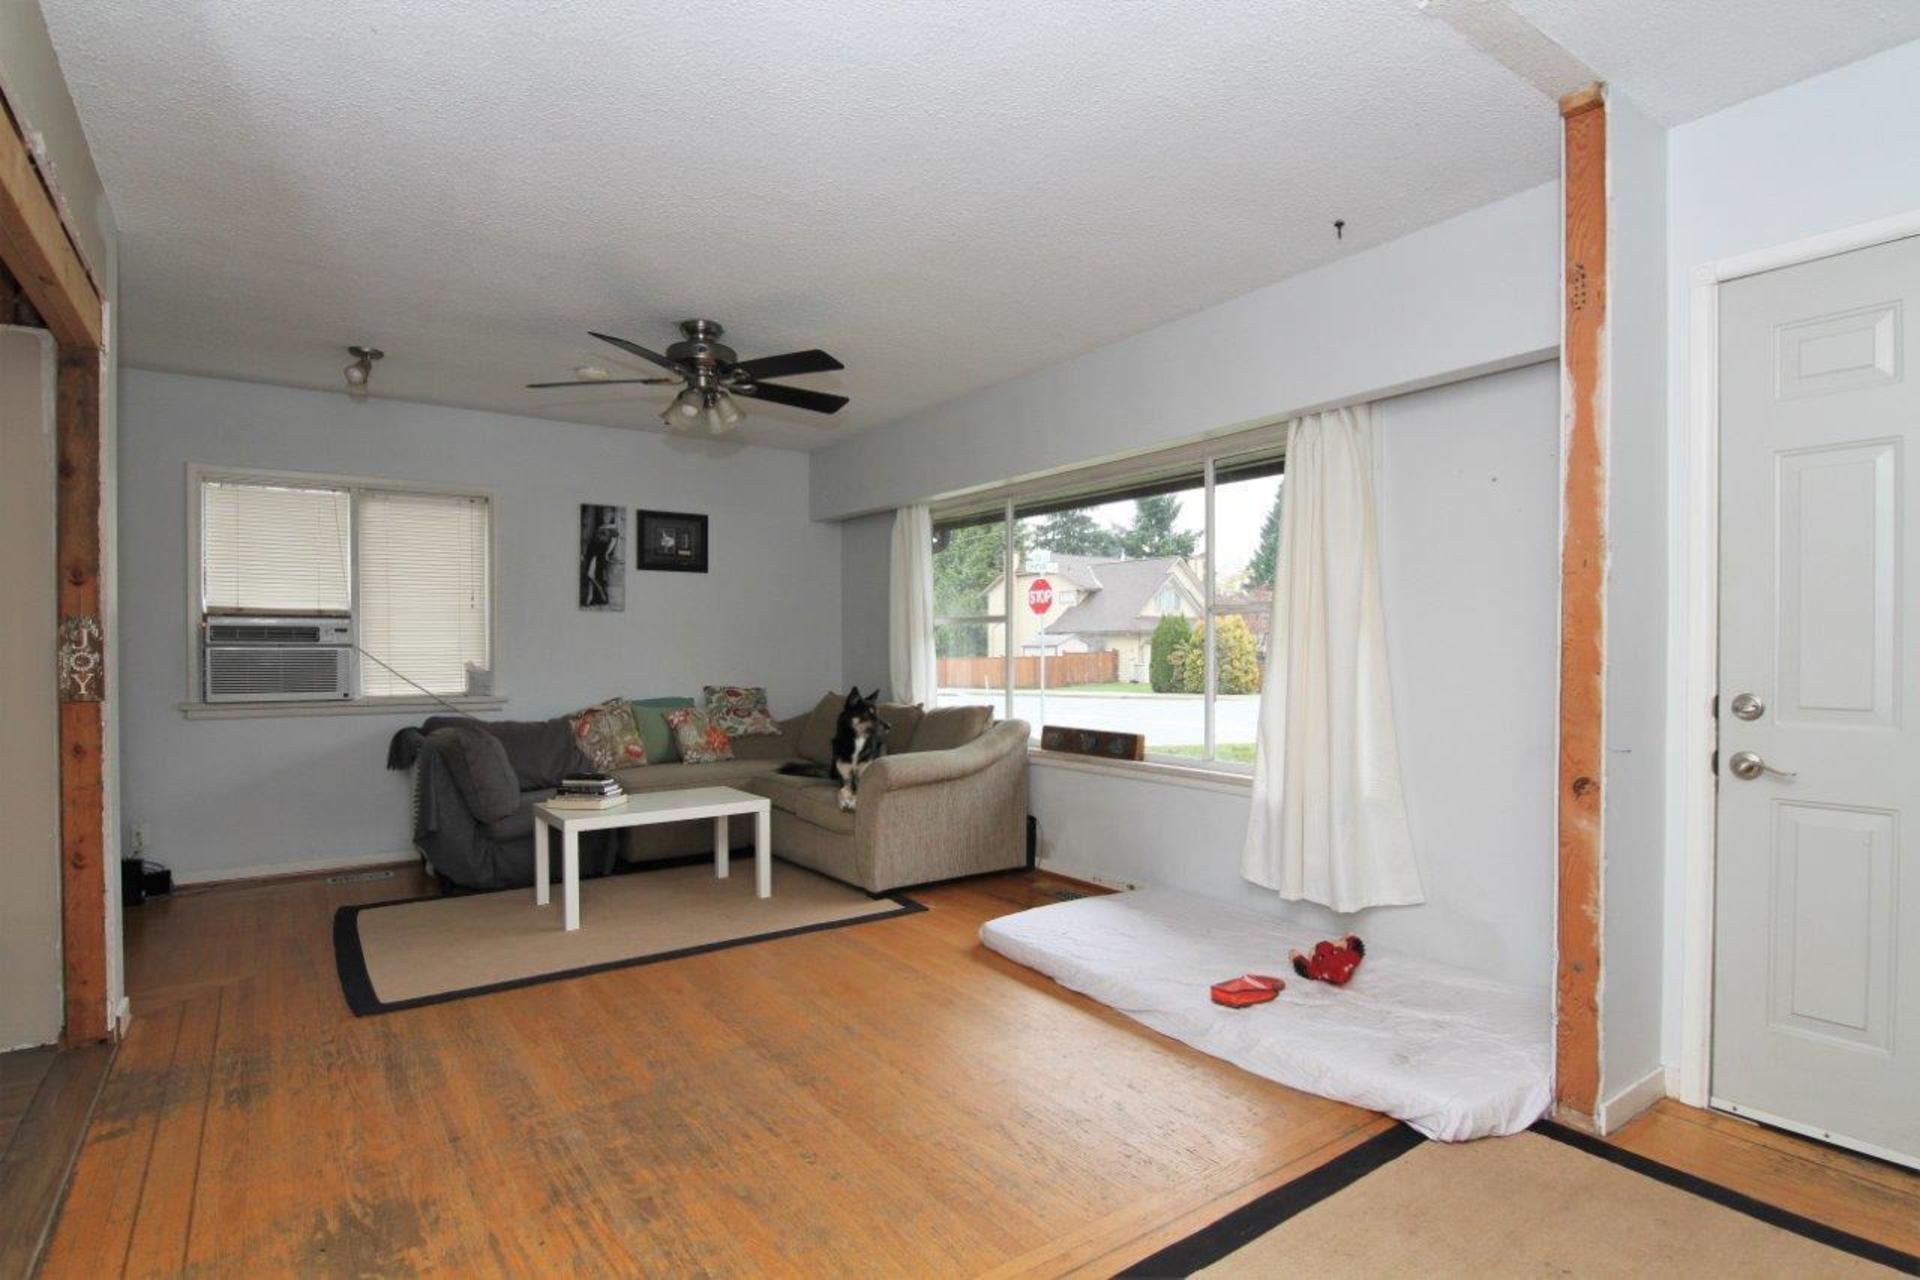 12351-203-street-west-central-maple-ridge-03 at 12351 203 Street, West Central, Maple Ridge